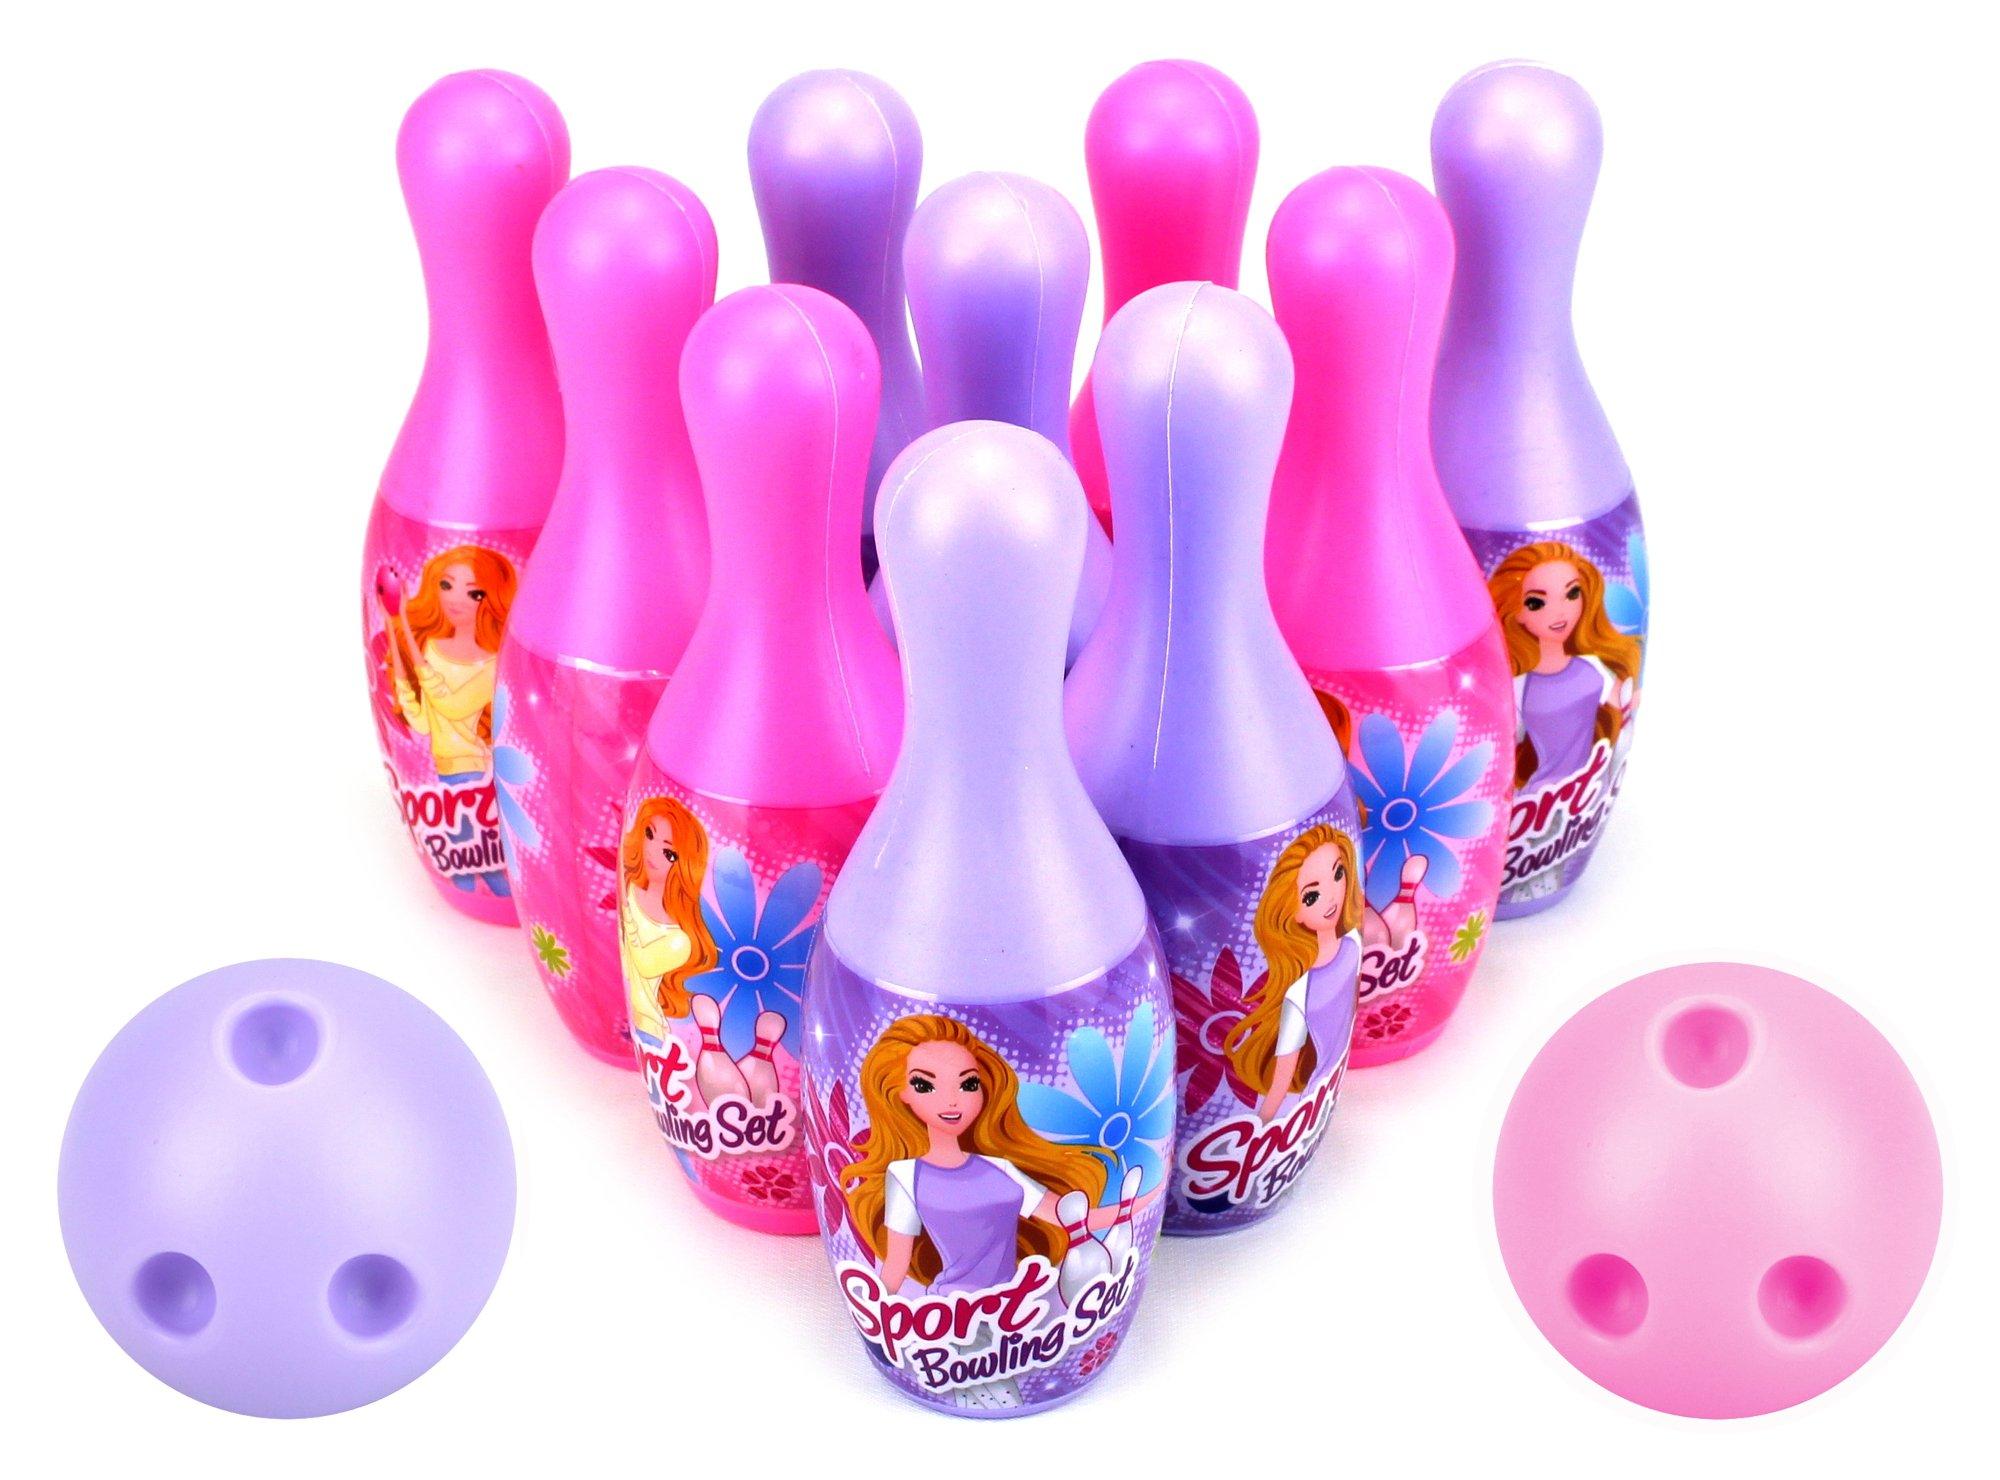 VT Princess Sport Children's Mini 12 Piece Toy Bowling Set w/ 10 Pins, 2 Bowling Balls